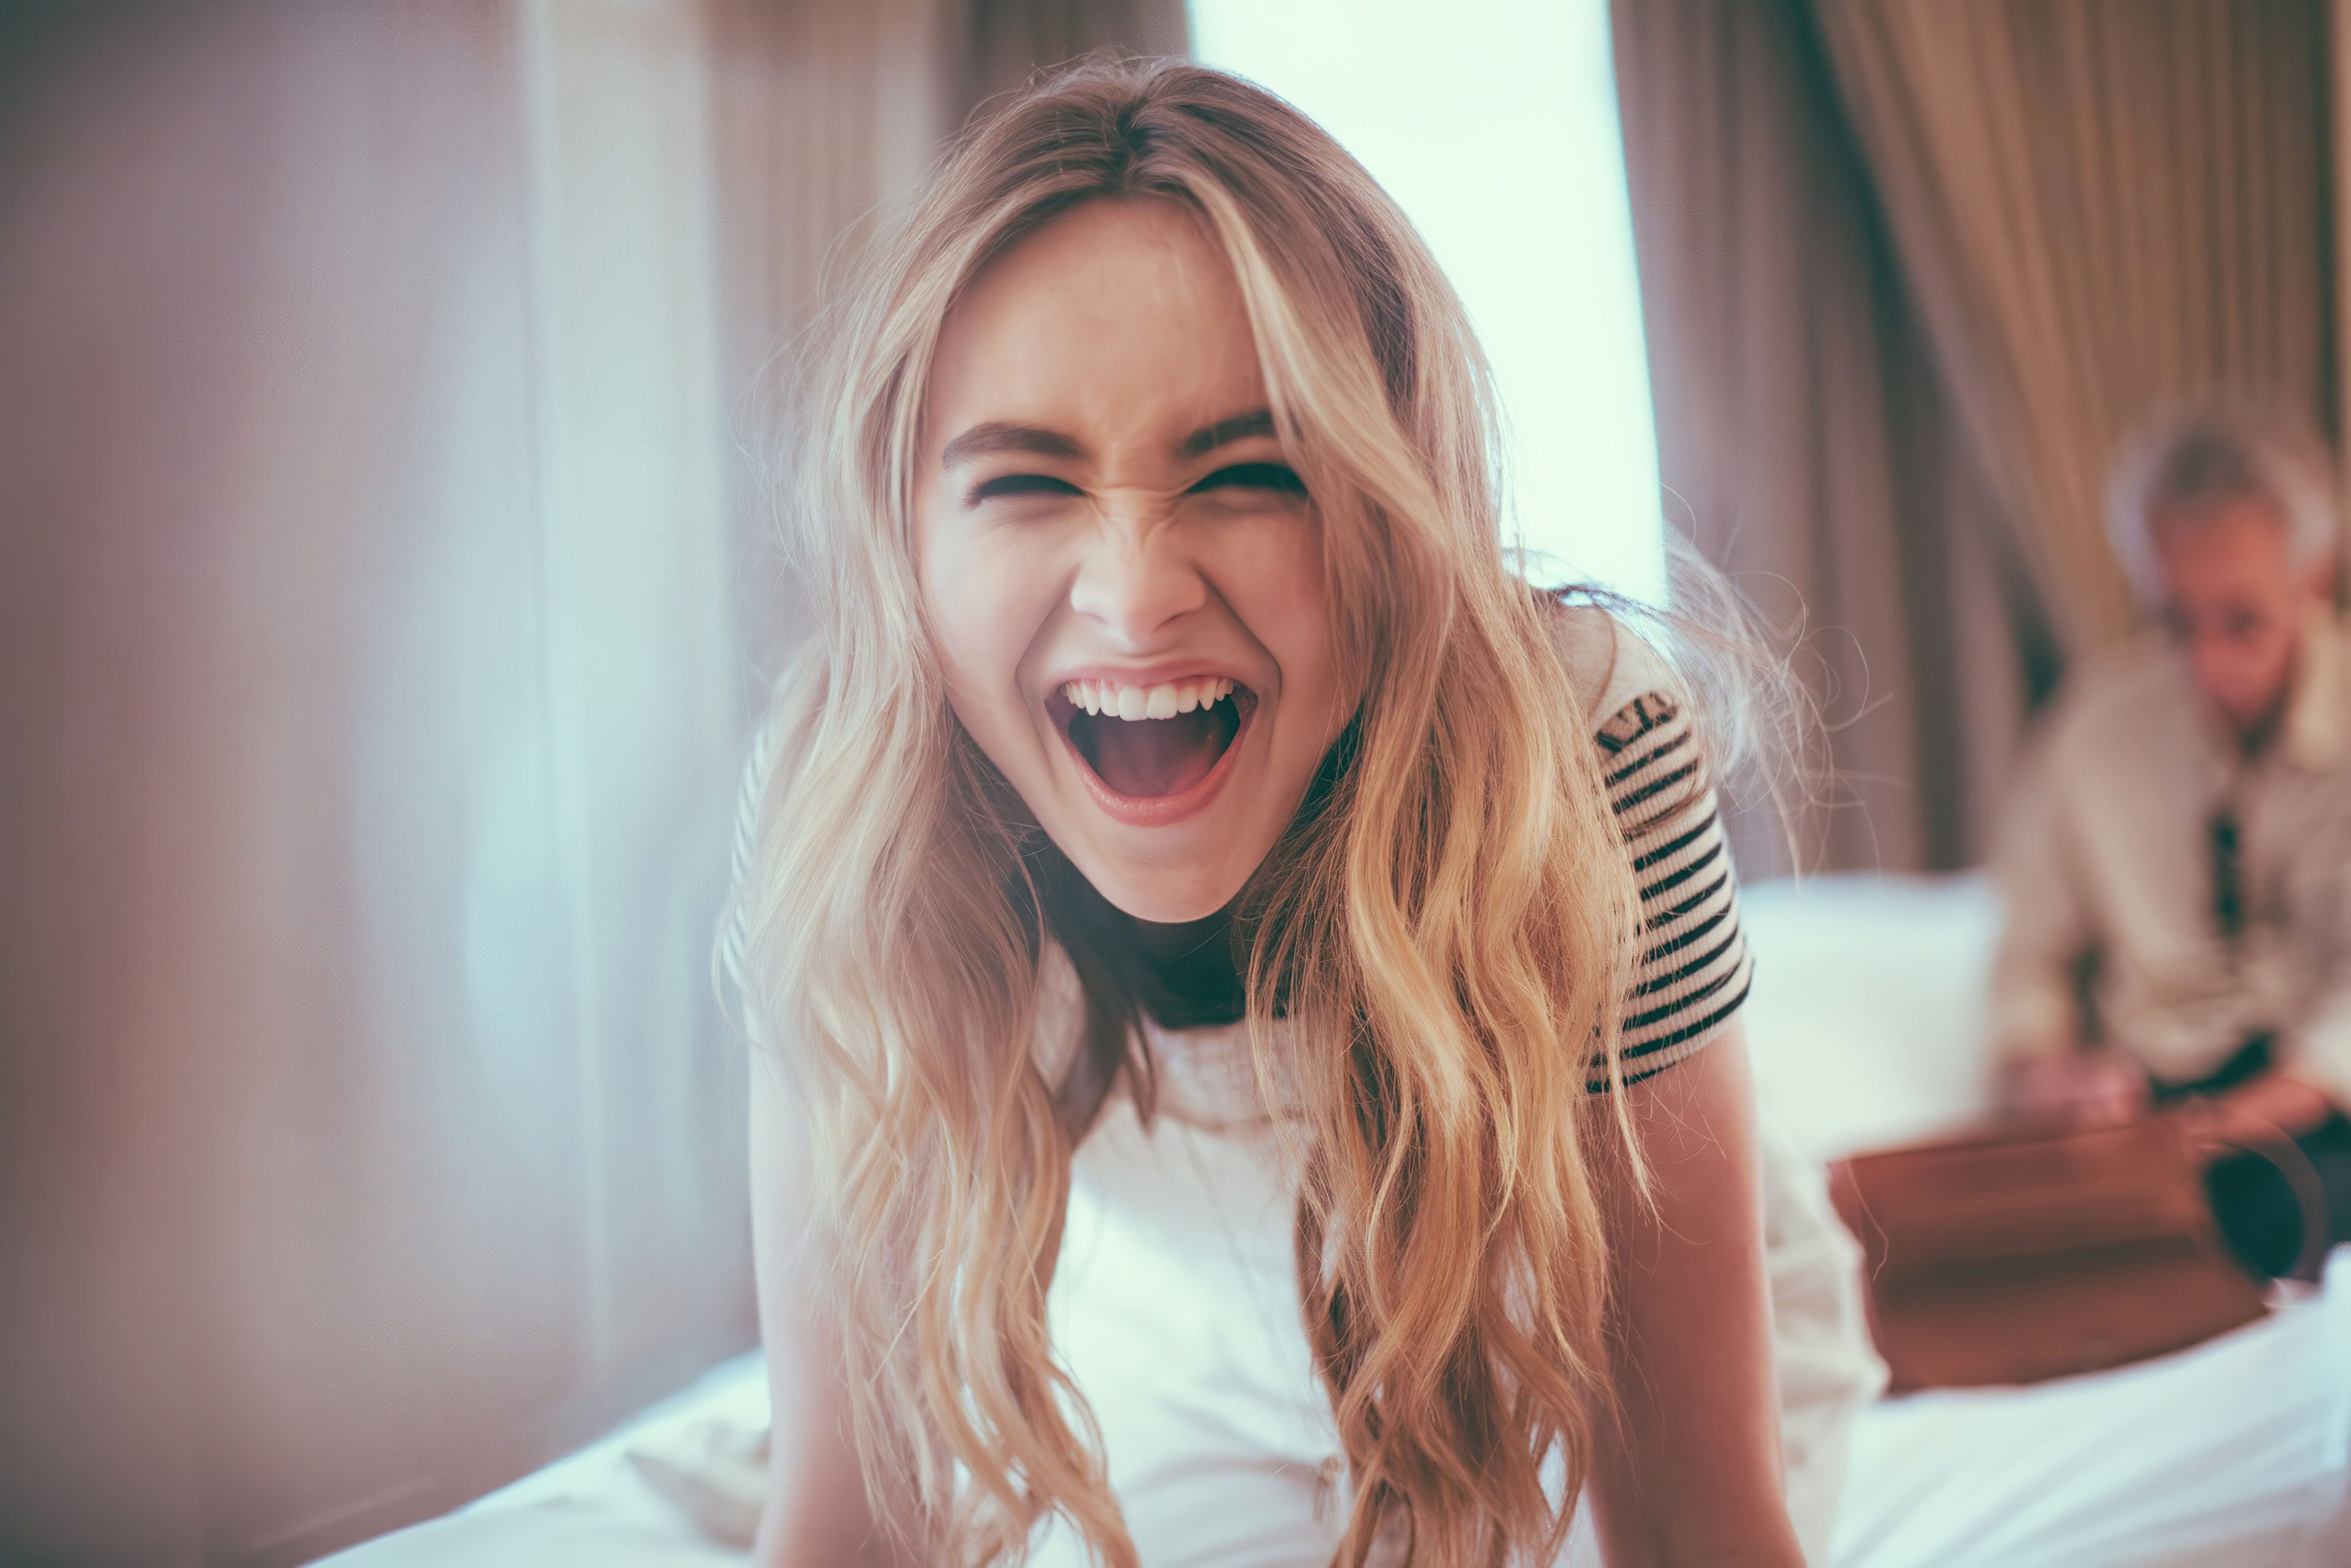 sabrina carpenter cute smiling 2020 4k 1608983892 - Sabrina Carpenter Cute Smiling 2020 4k - Sabrina Carpenter Cute Smiling 2020 4k wallpapers